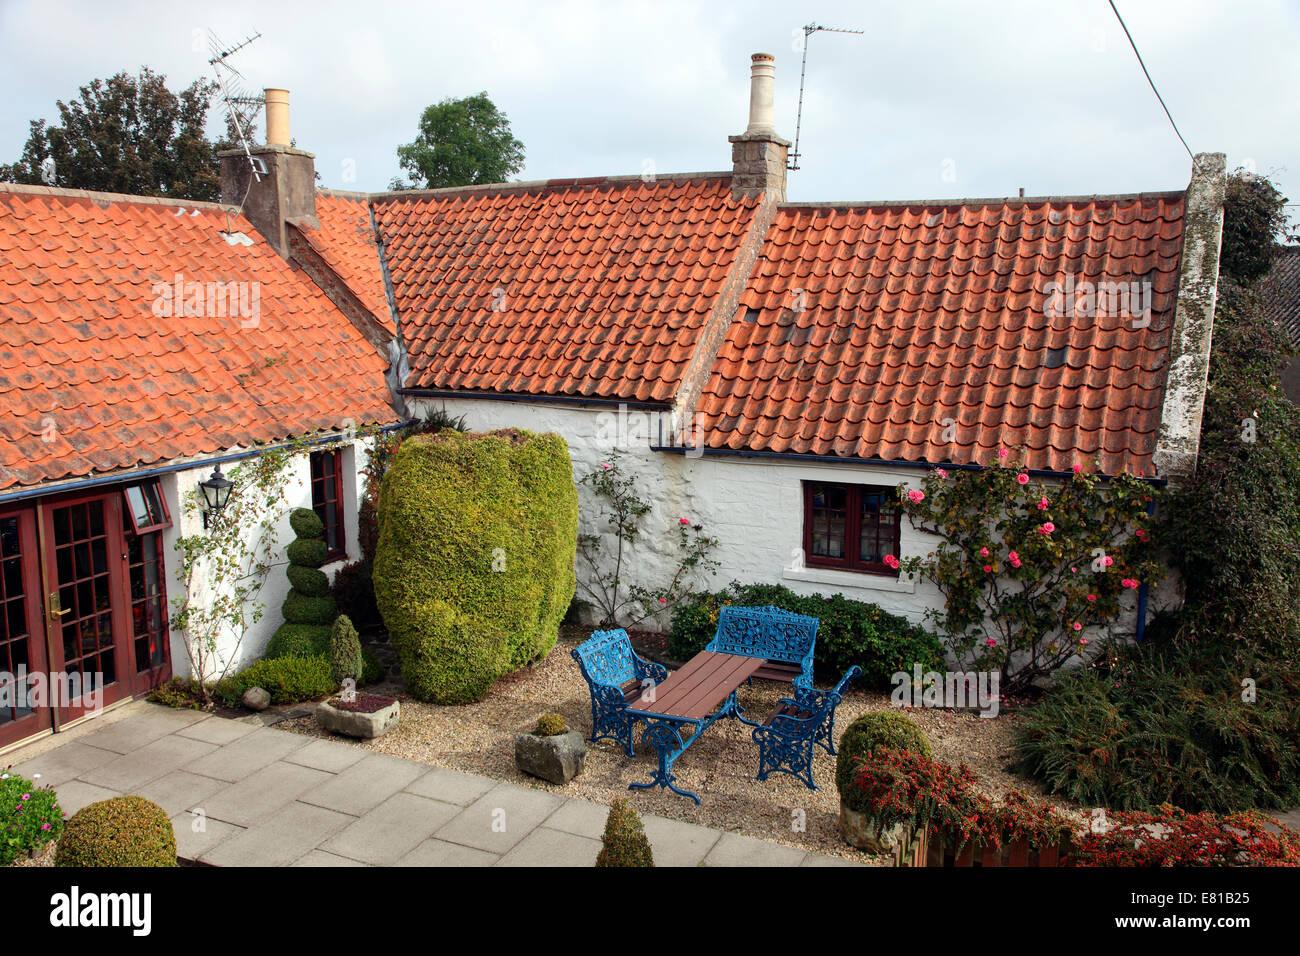 Champany Inn, ein gehobenes Restaurant mit Zimmern in Linlithgow. Stockbild